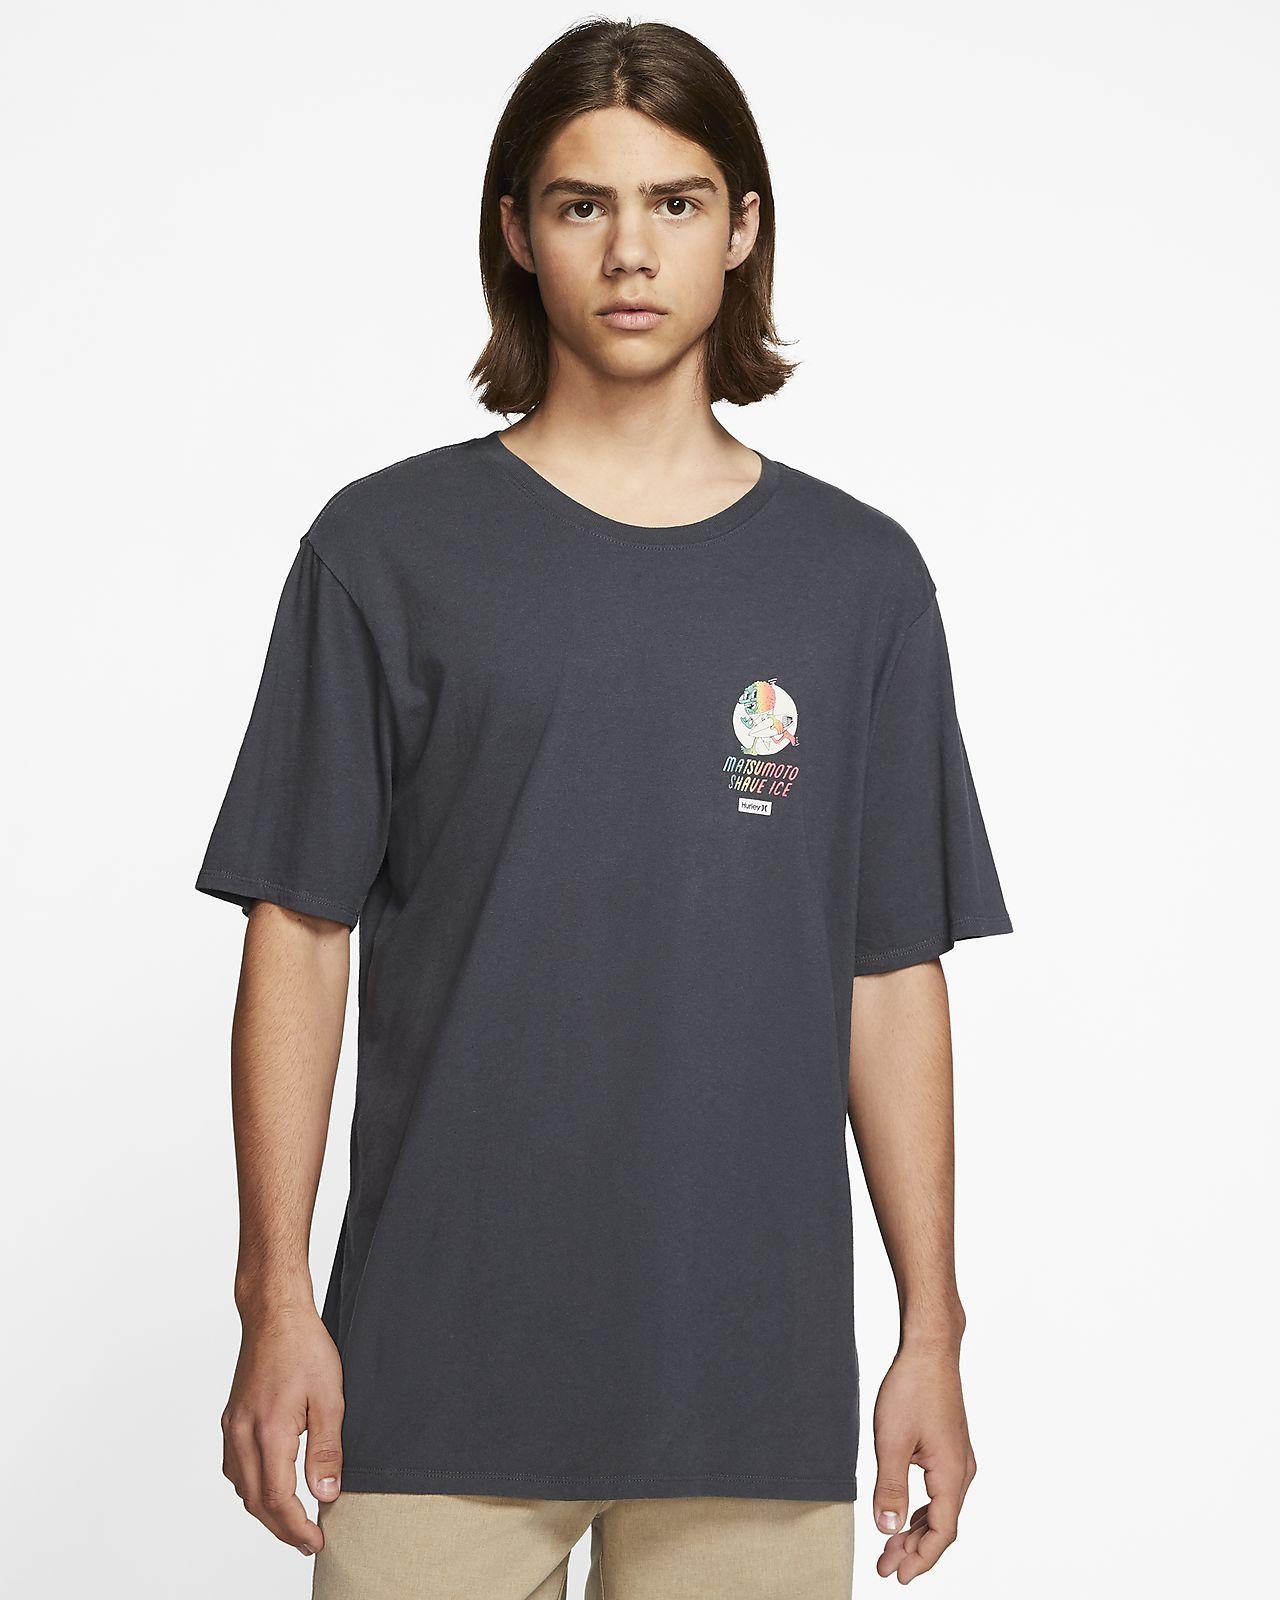 T-shirt Hurley x Matsumoto Shave Ice - Uomo